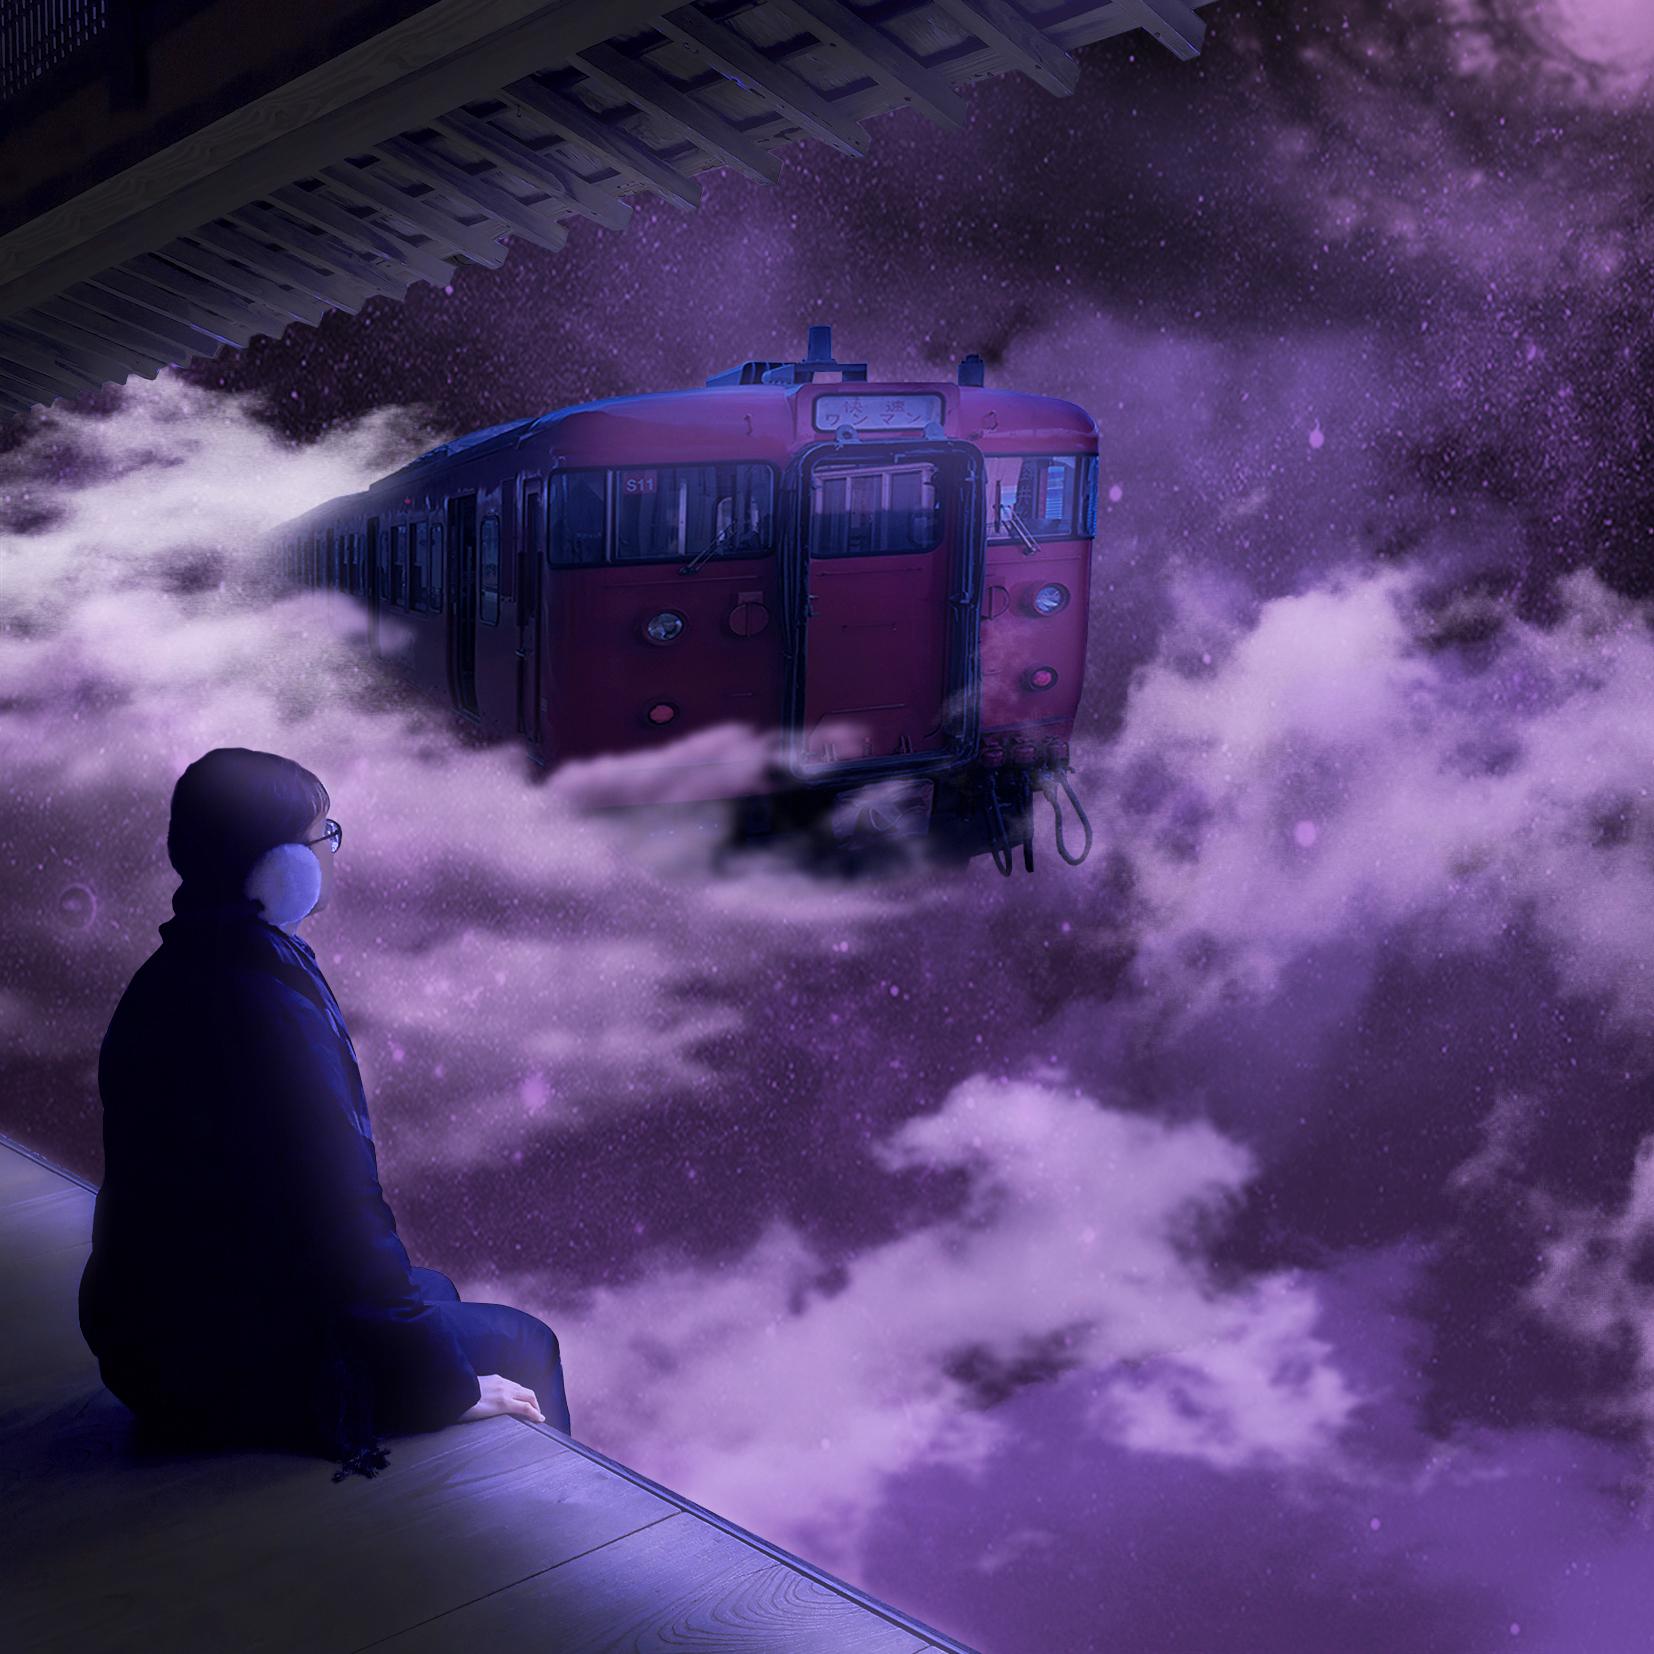 Sky Train Digital Art by Alvin Sim